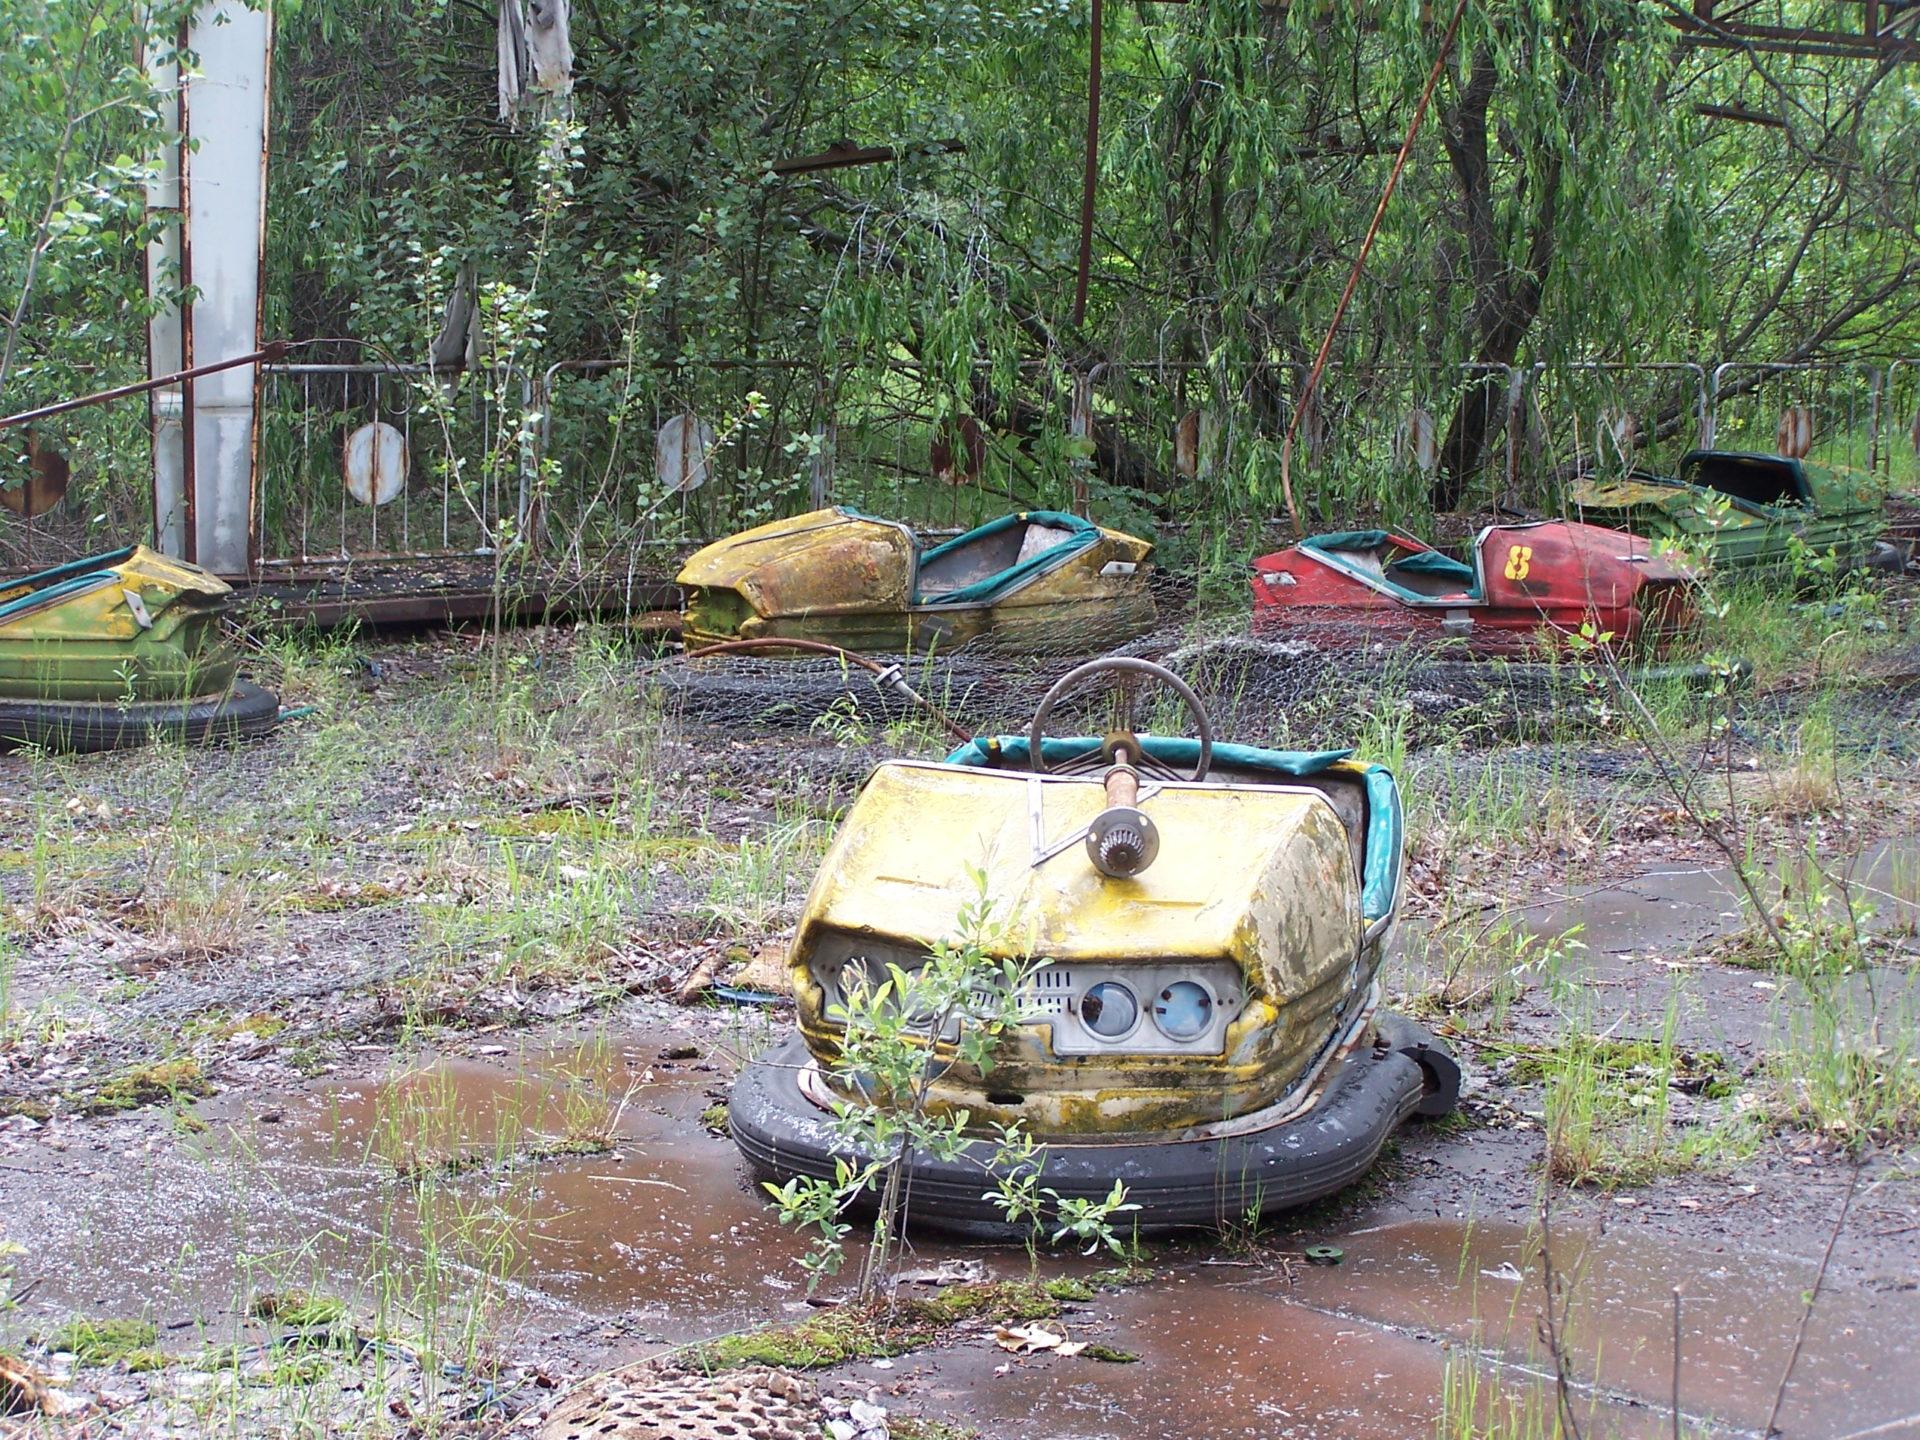 Chernobyl funfair